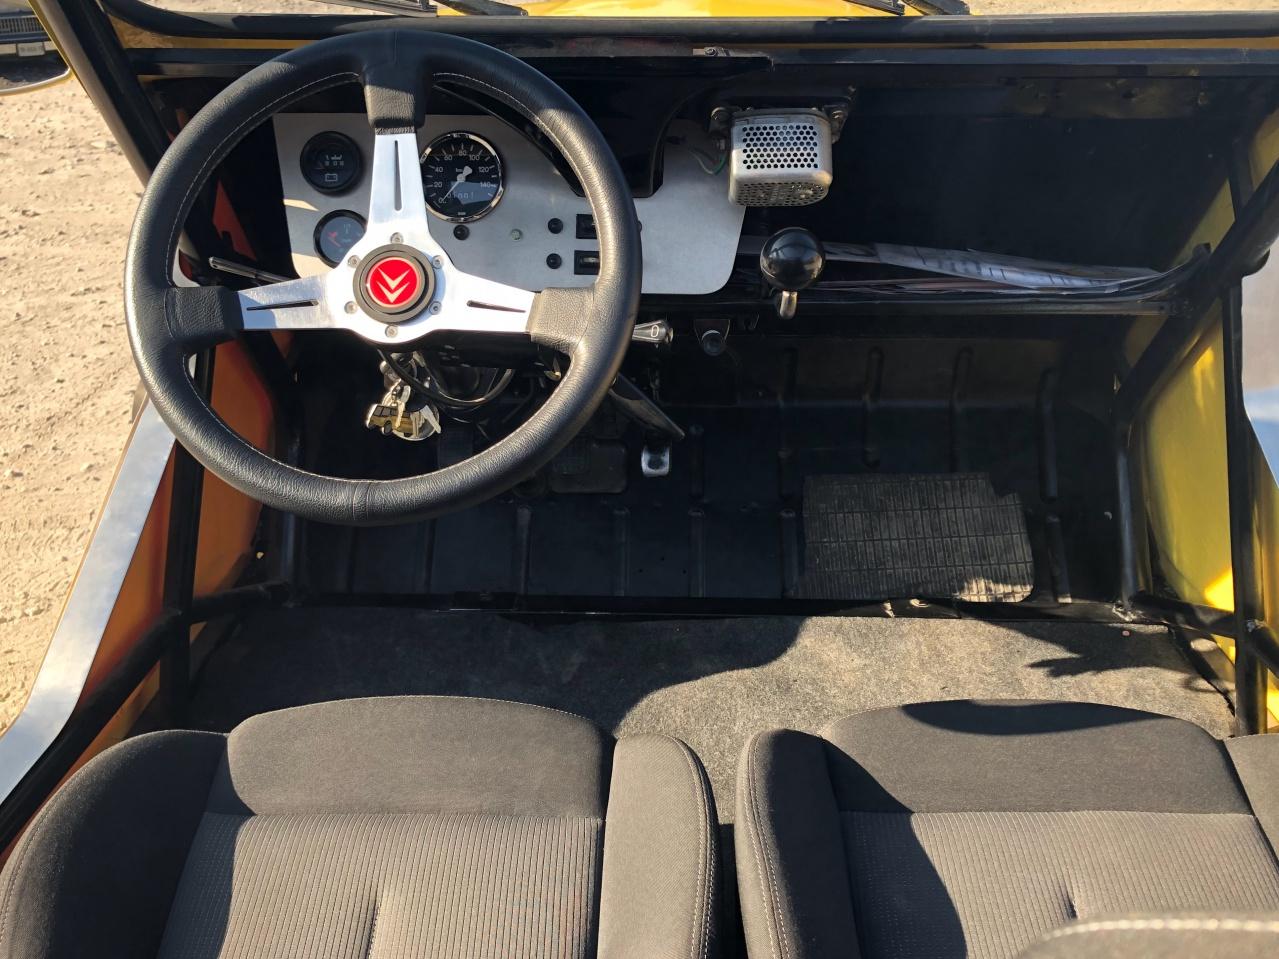 deuggy deuche buggy garage auto moto la teste v hicules anciens pyla classic cars. Black Bedroom Furniture Sets. Home Design Ideas